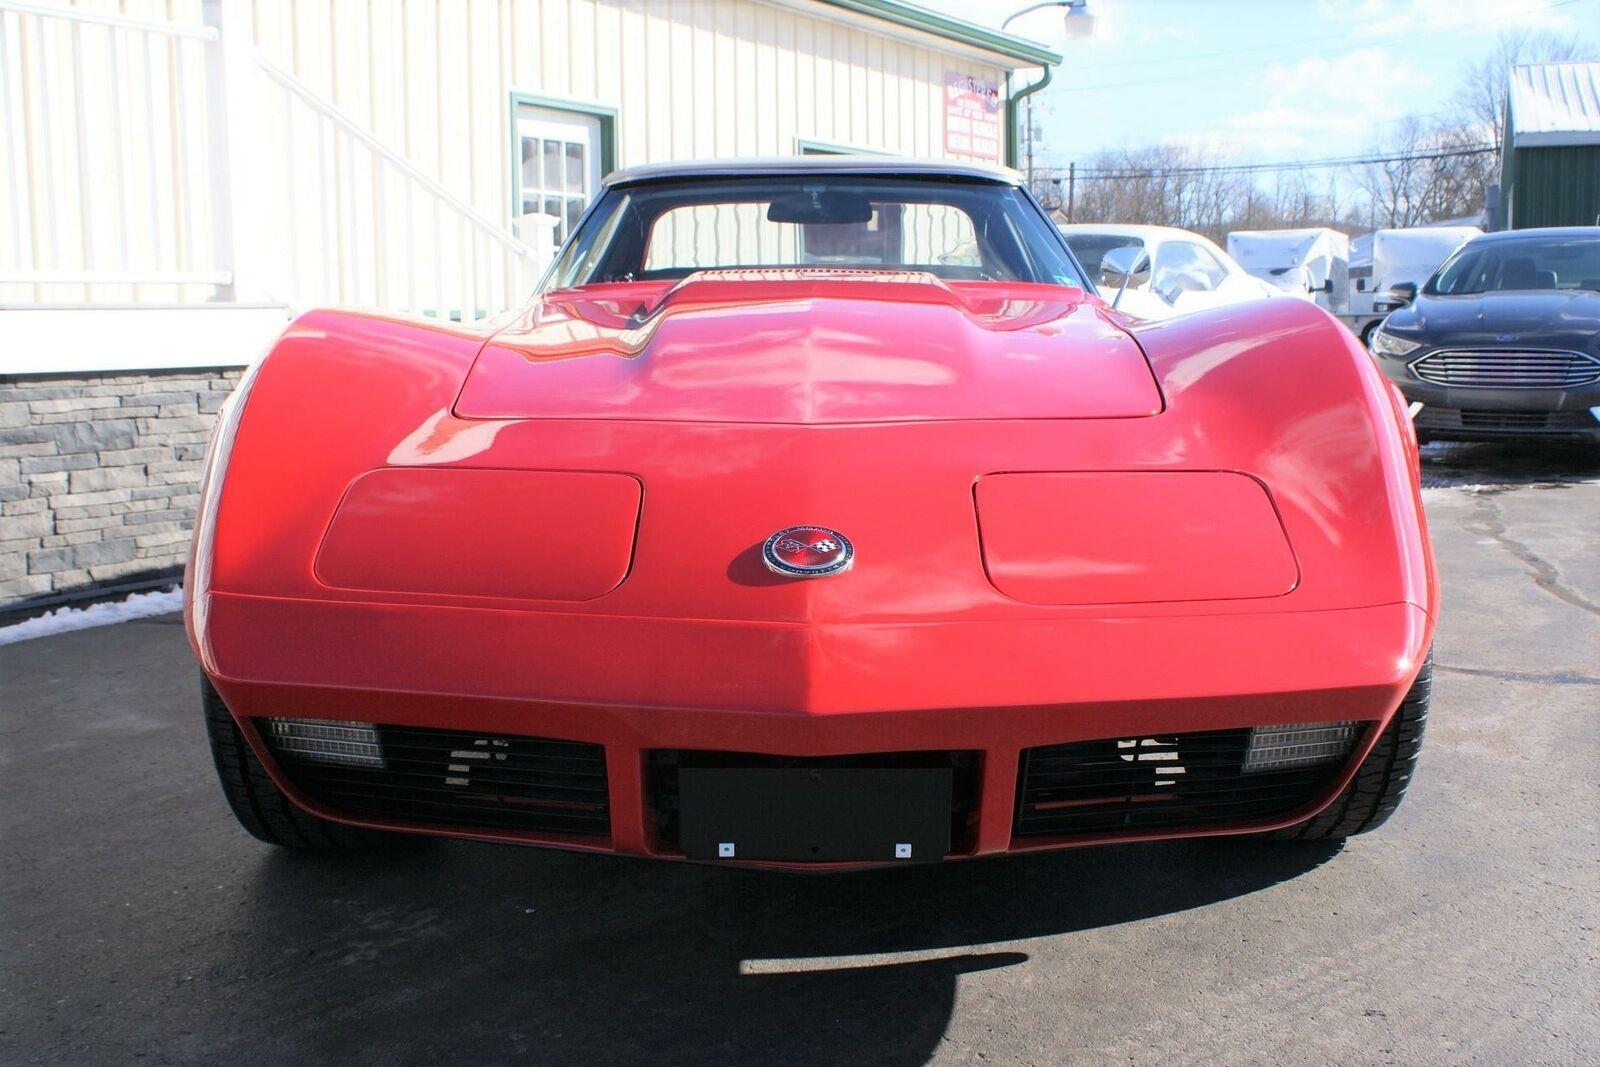 1974 Red Chevrolet Corvette  L82   C3 Corvette Photo 5